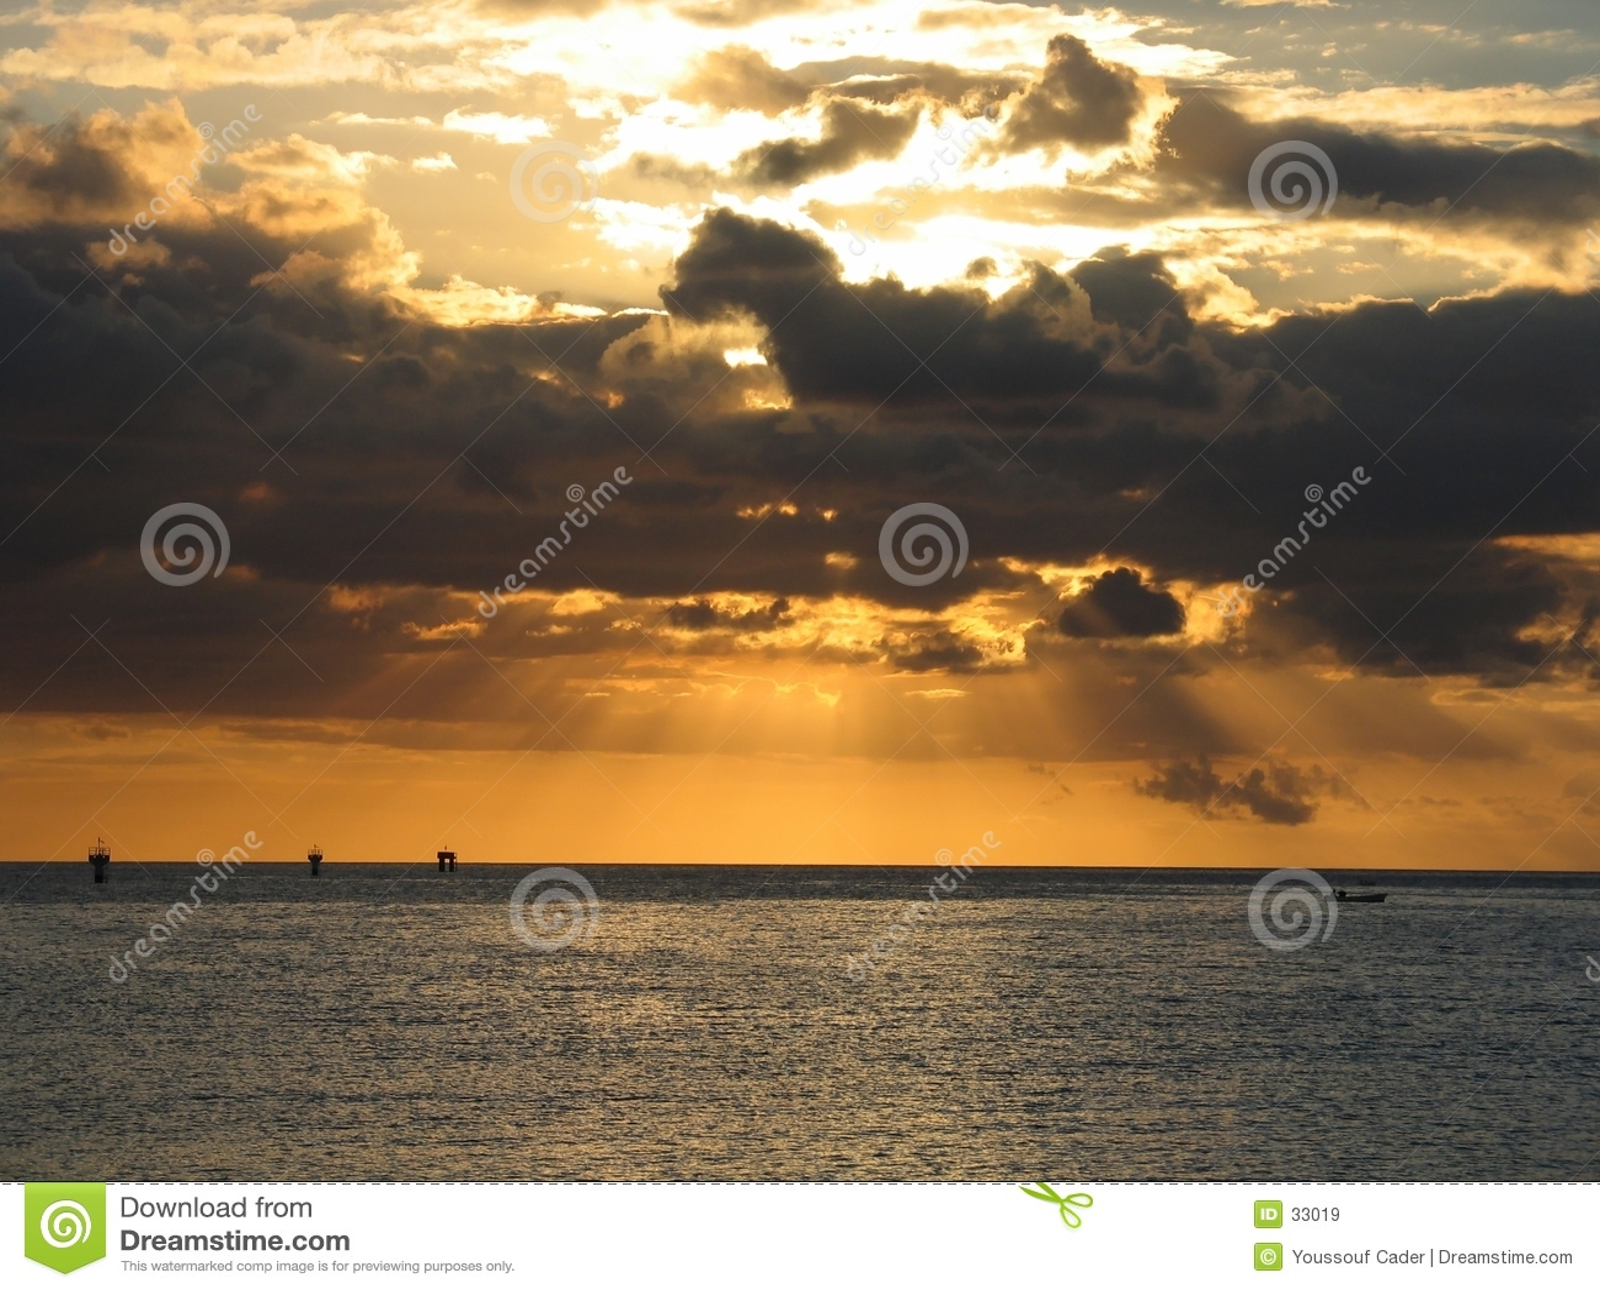 Orange Rays of light